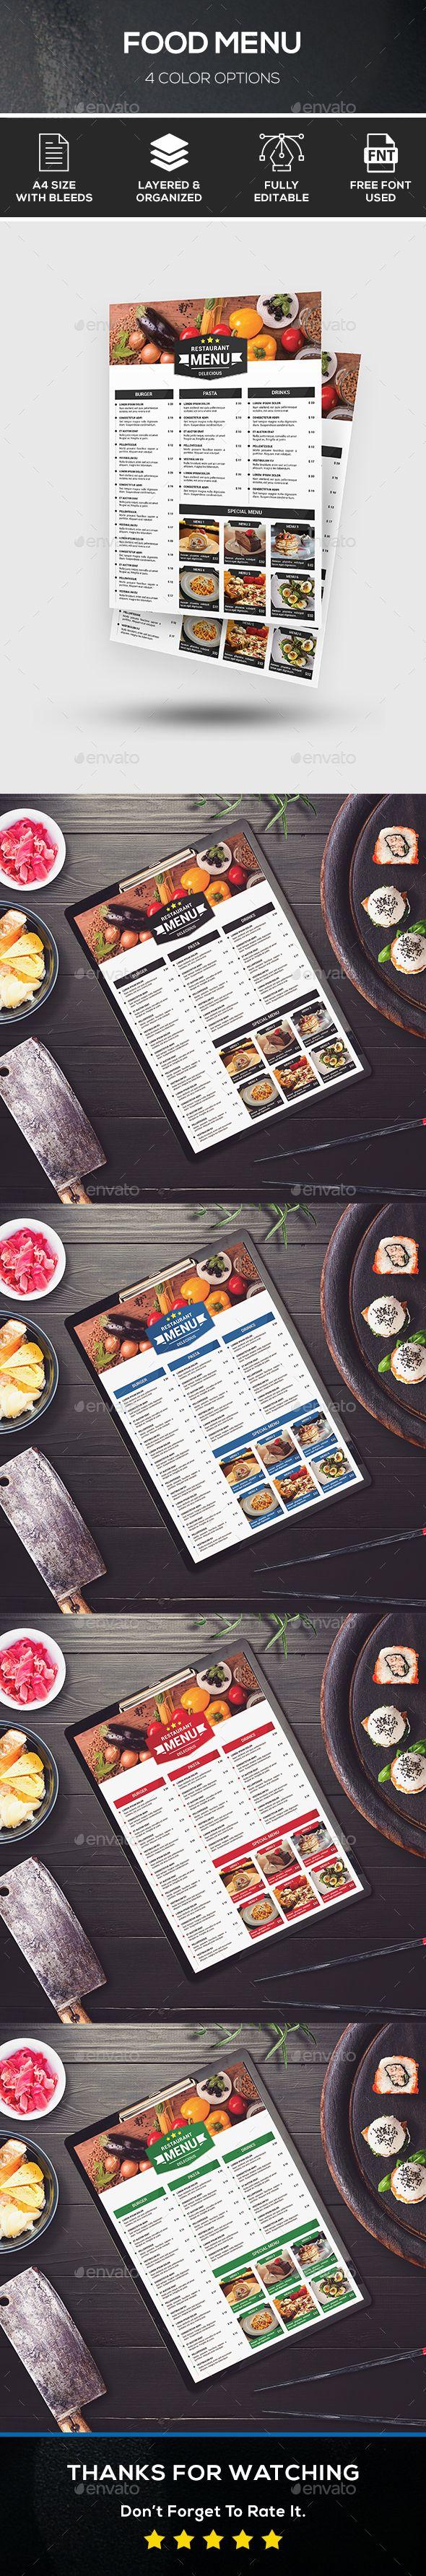 Food Menu Template PSD - 4 Color Options